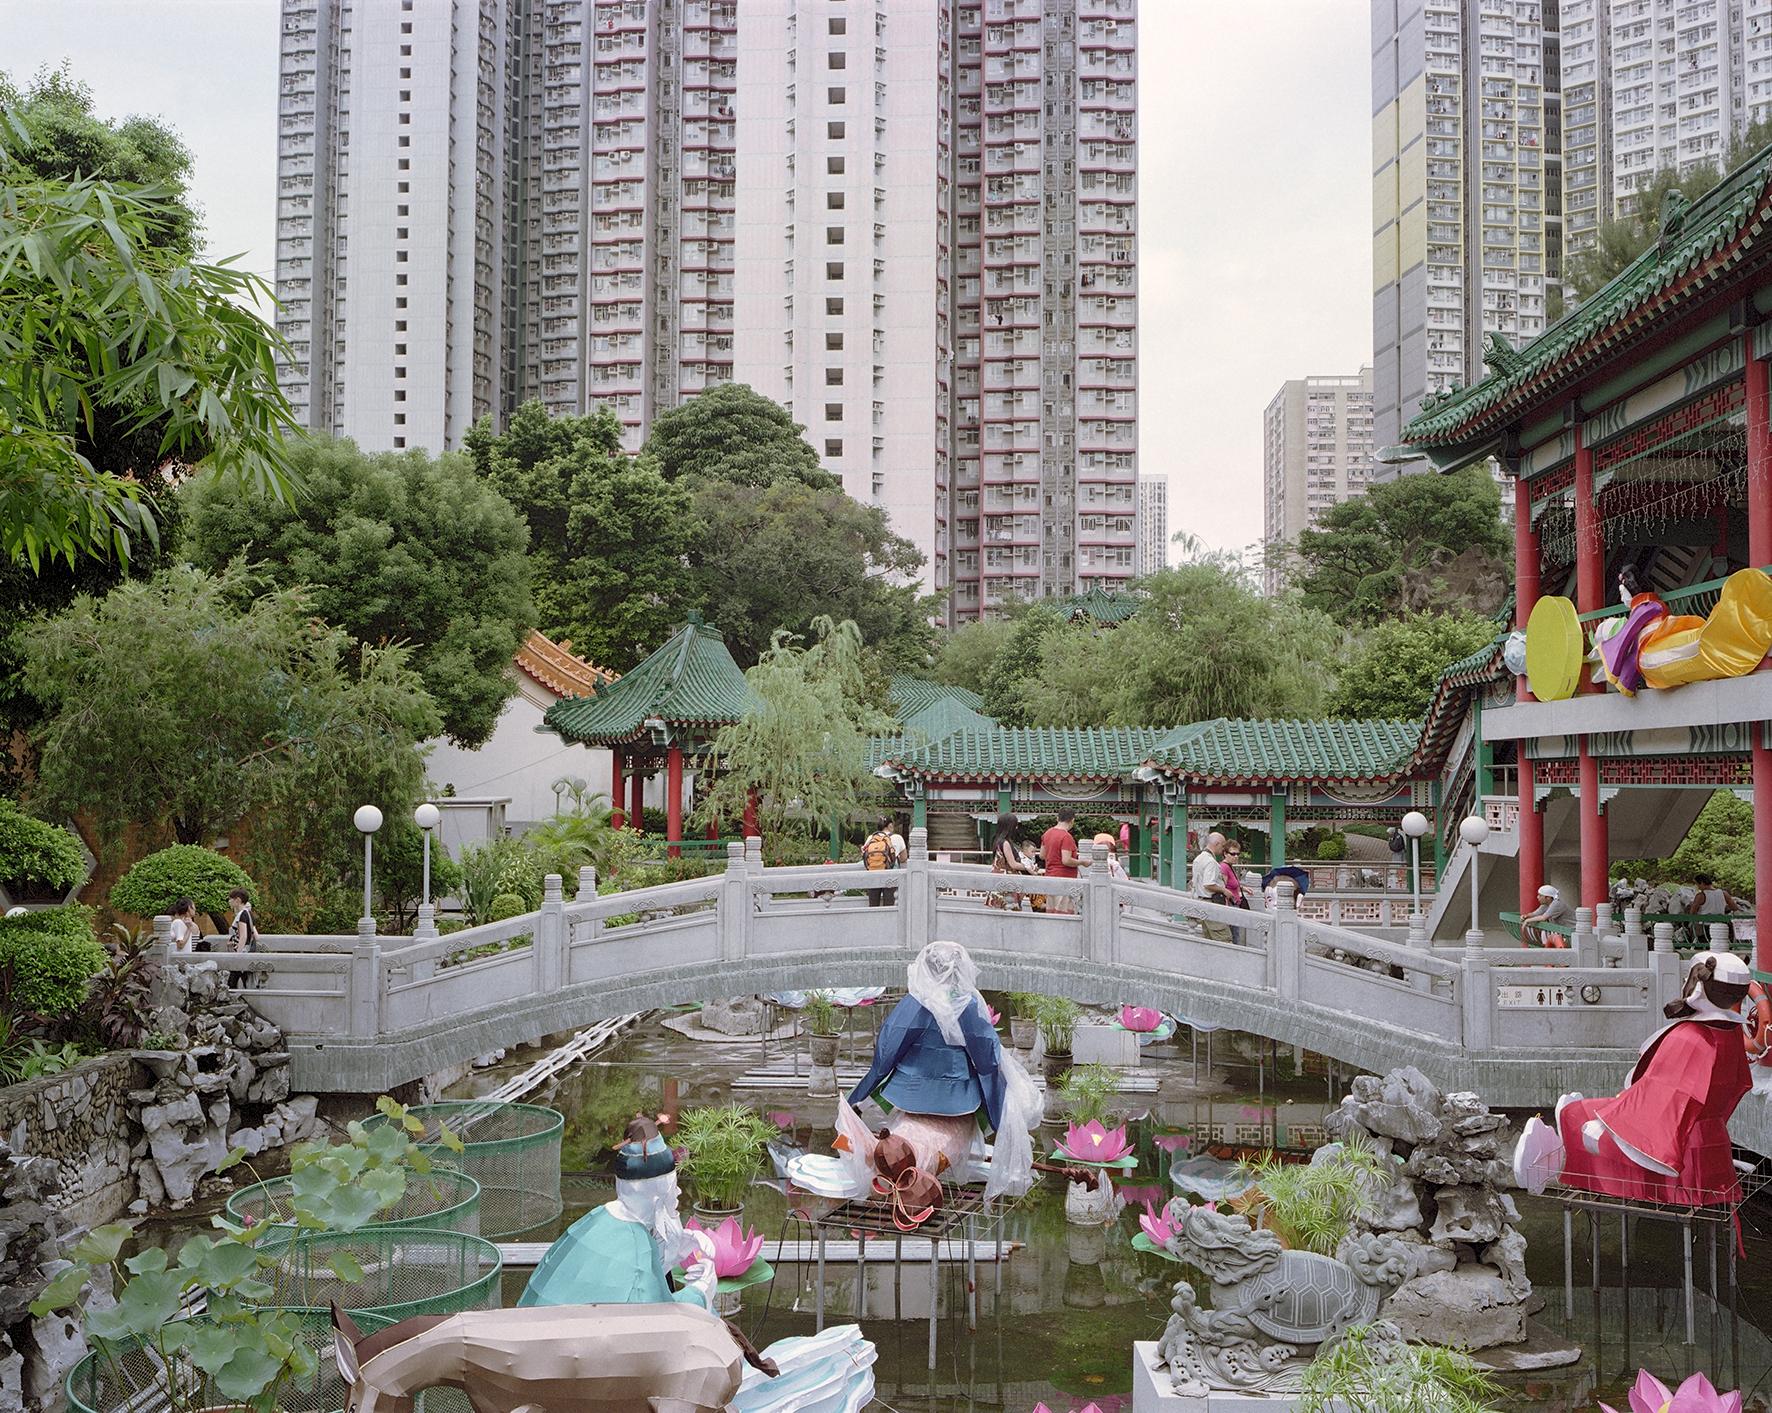 Hong Kong, 2010